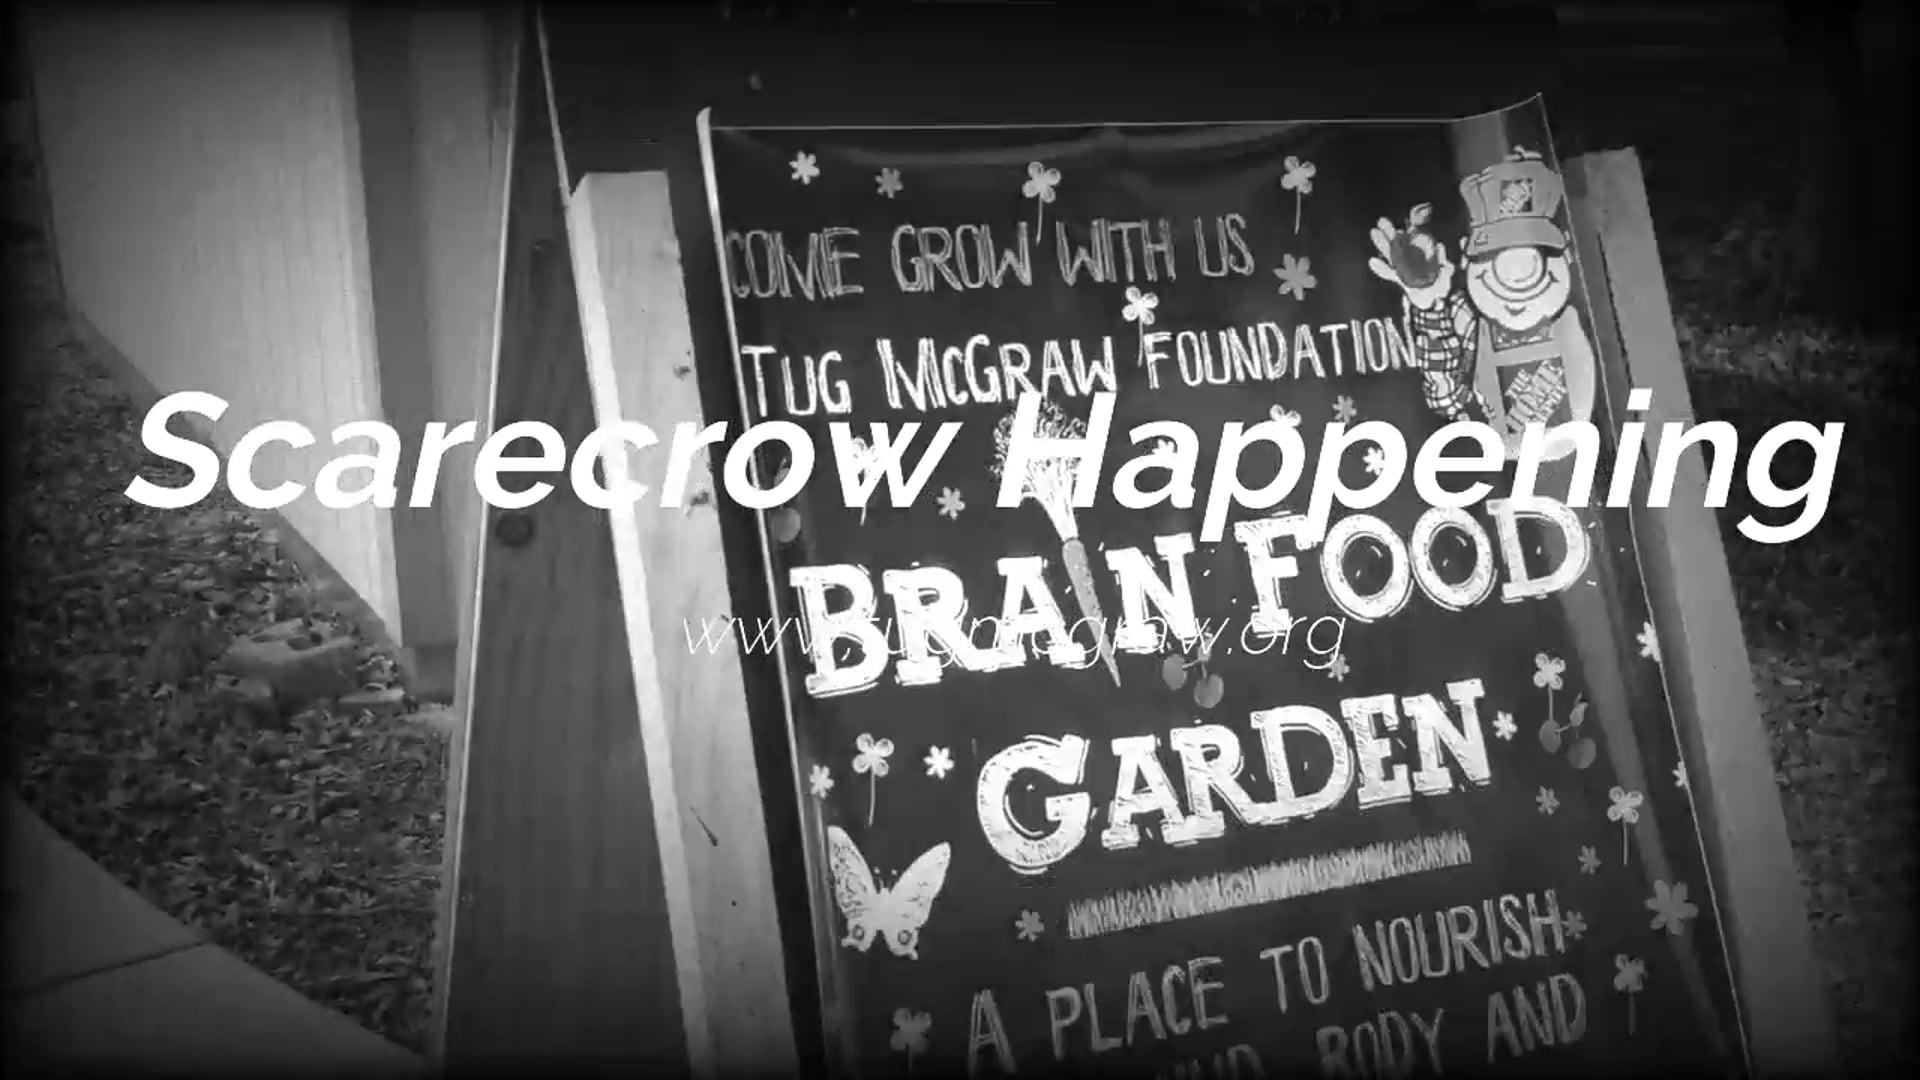 Virtual Tour of the Tug McGraw Scarecrows and Brain Food Garden